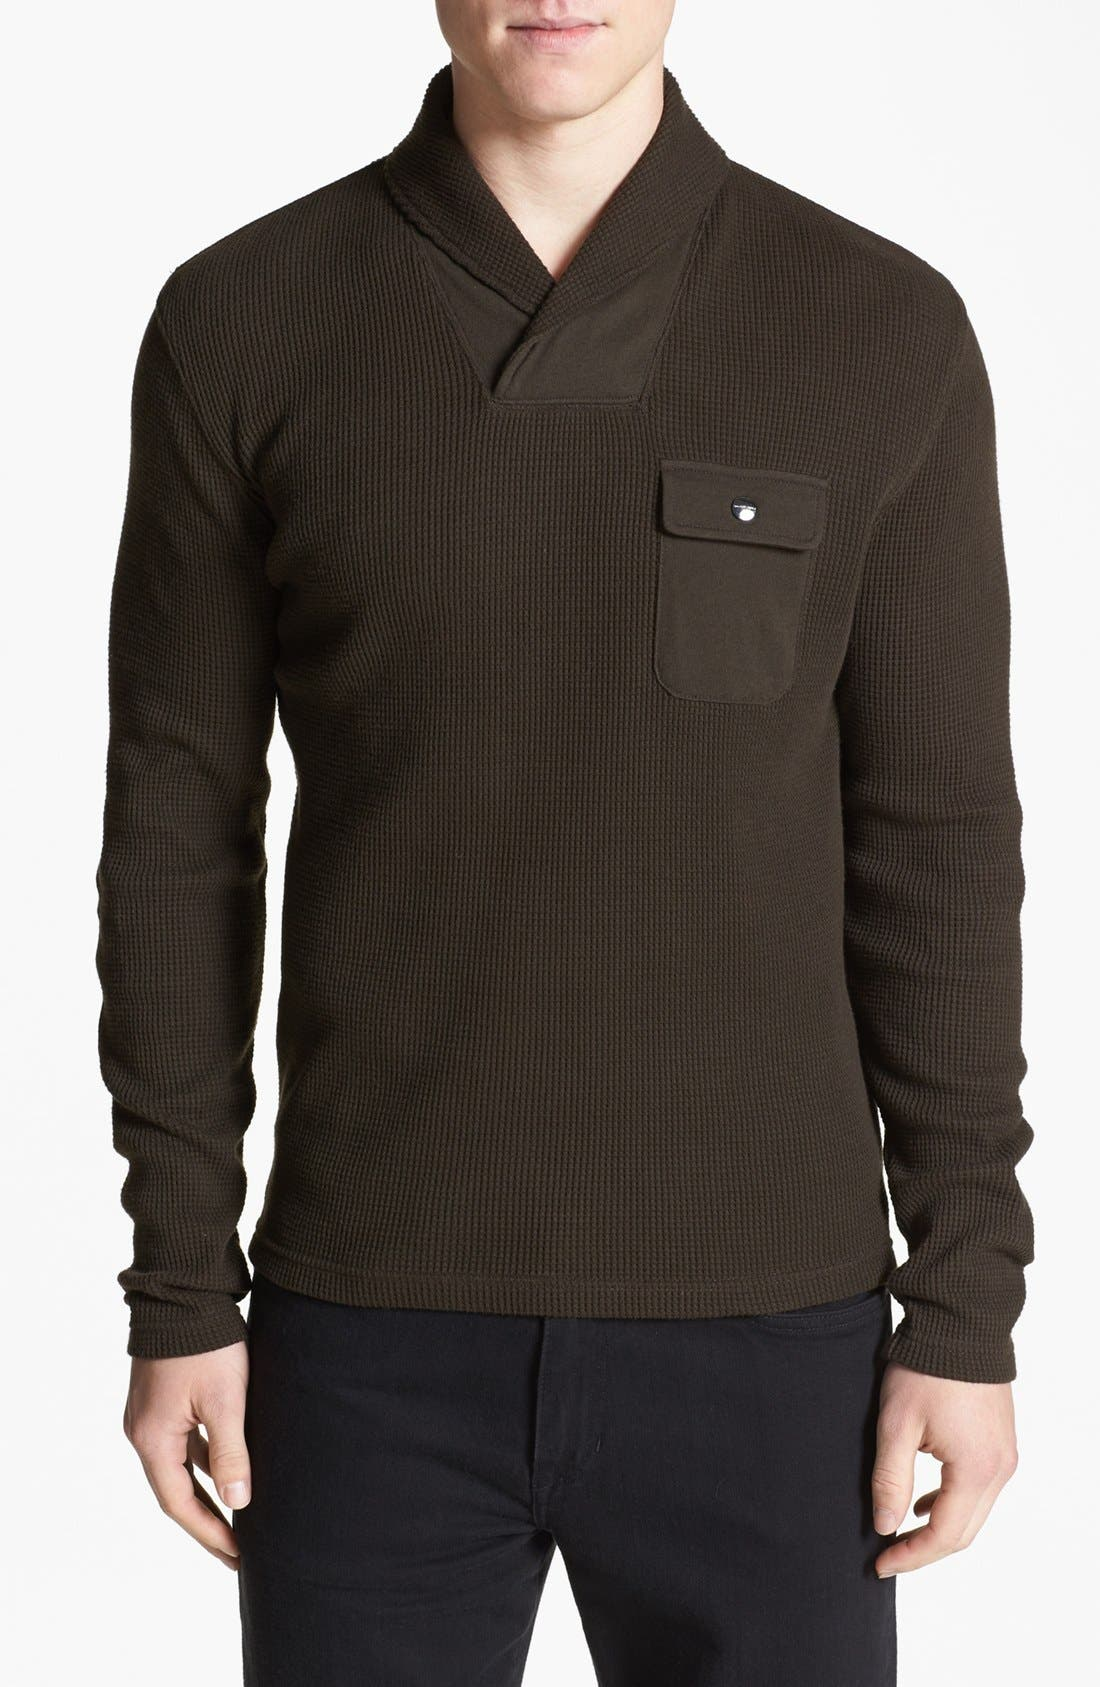 Main Image - Michael Kors 'Waffle Wrap' Sweater